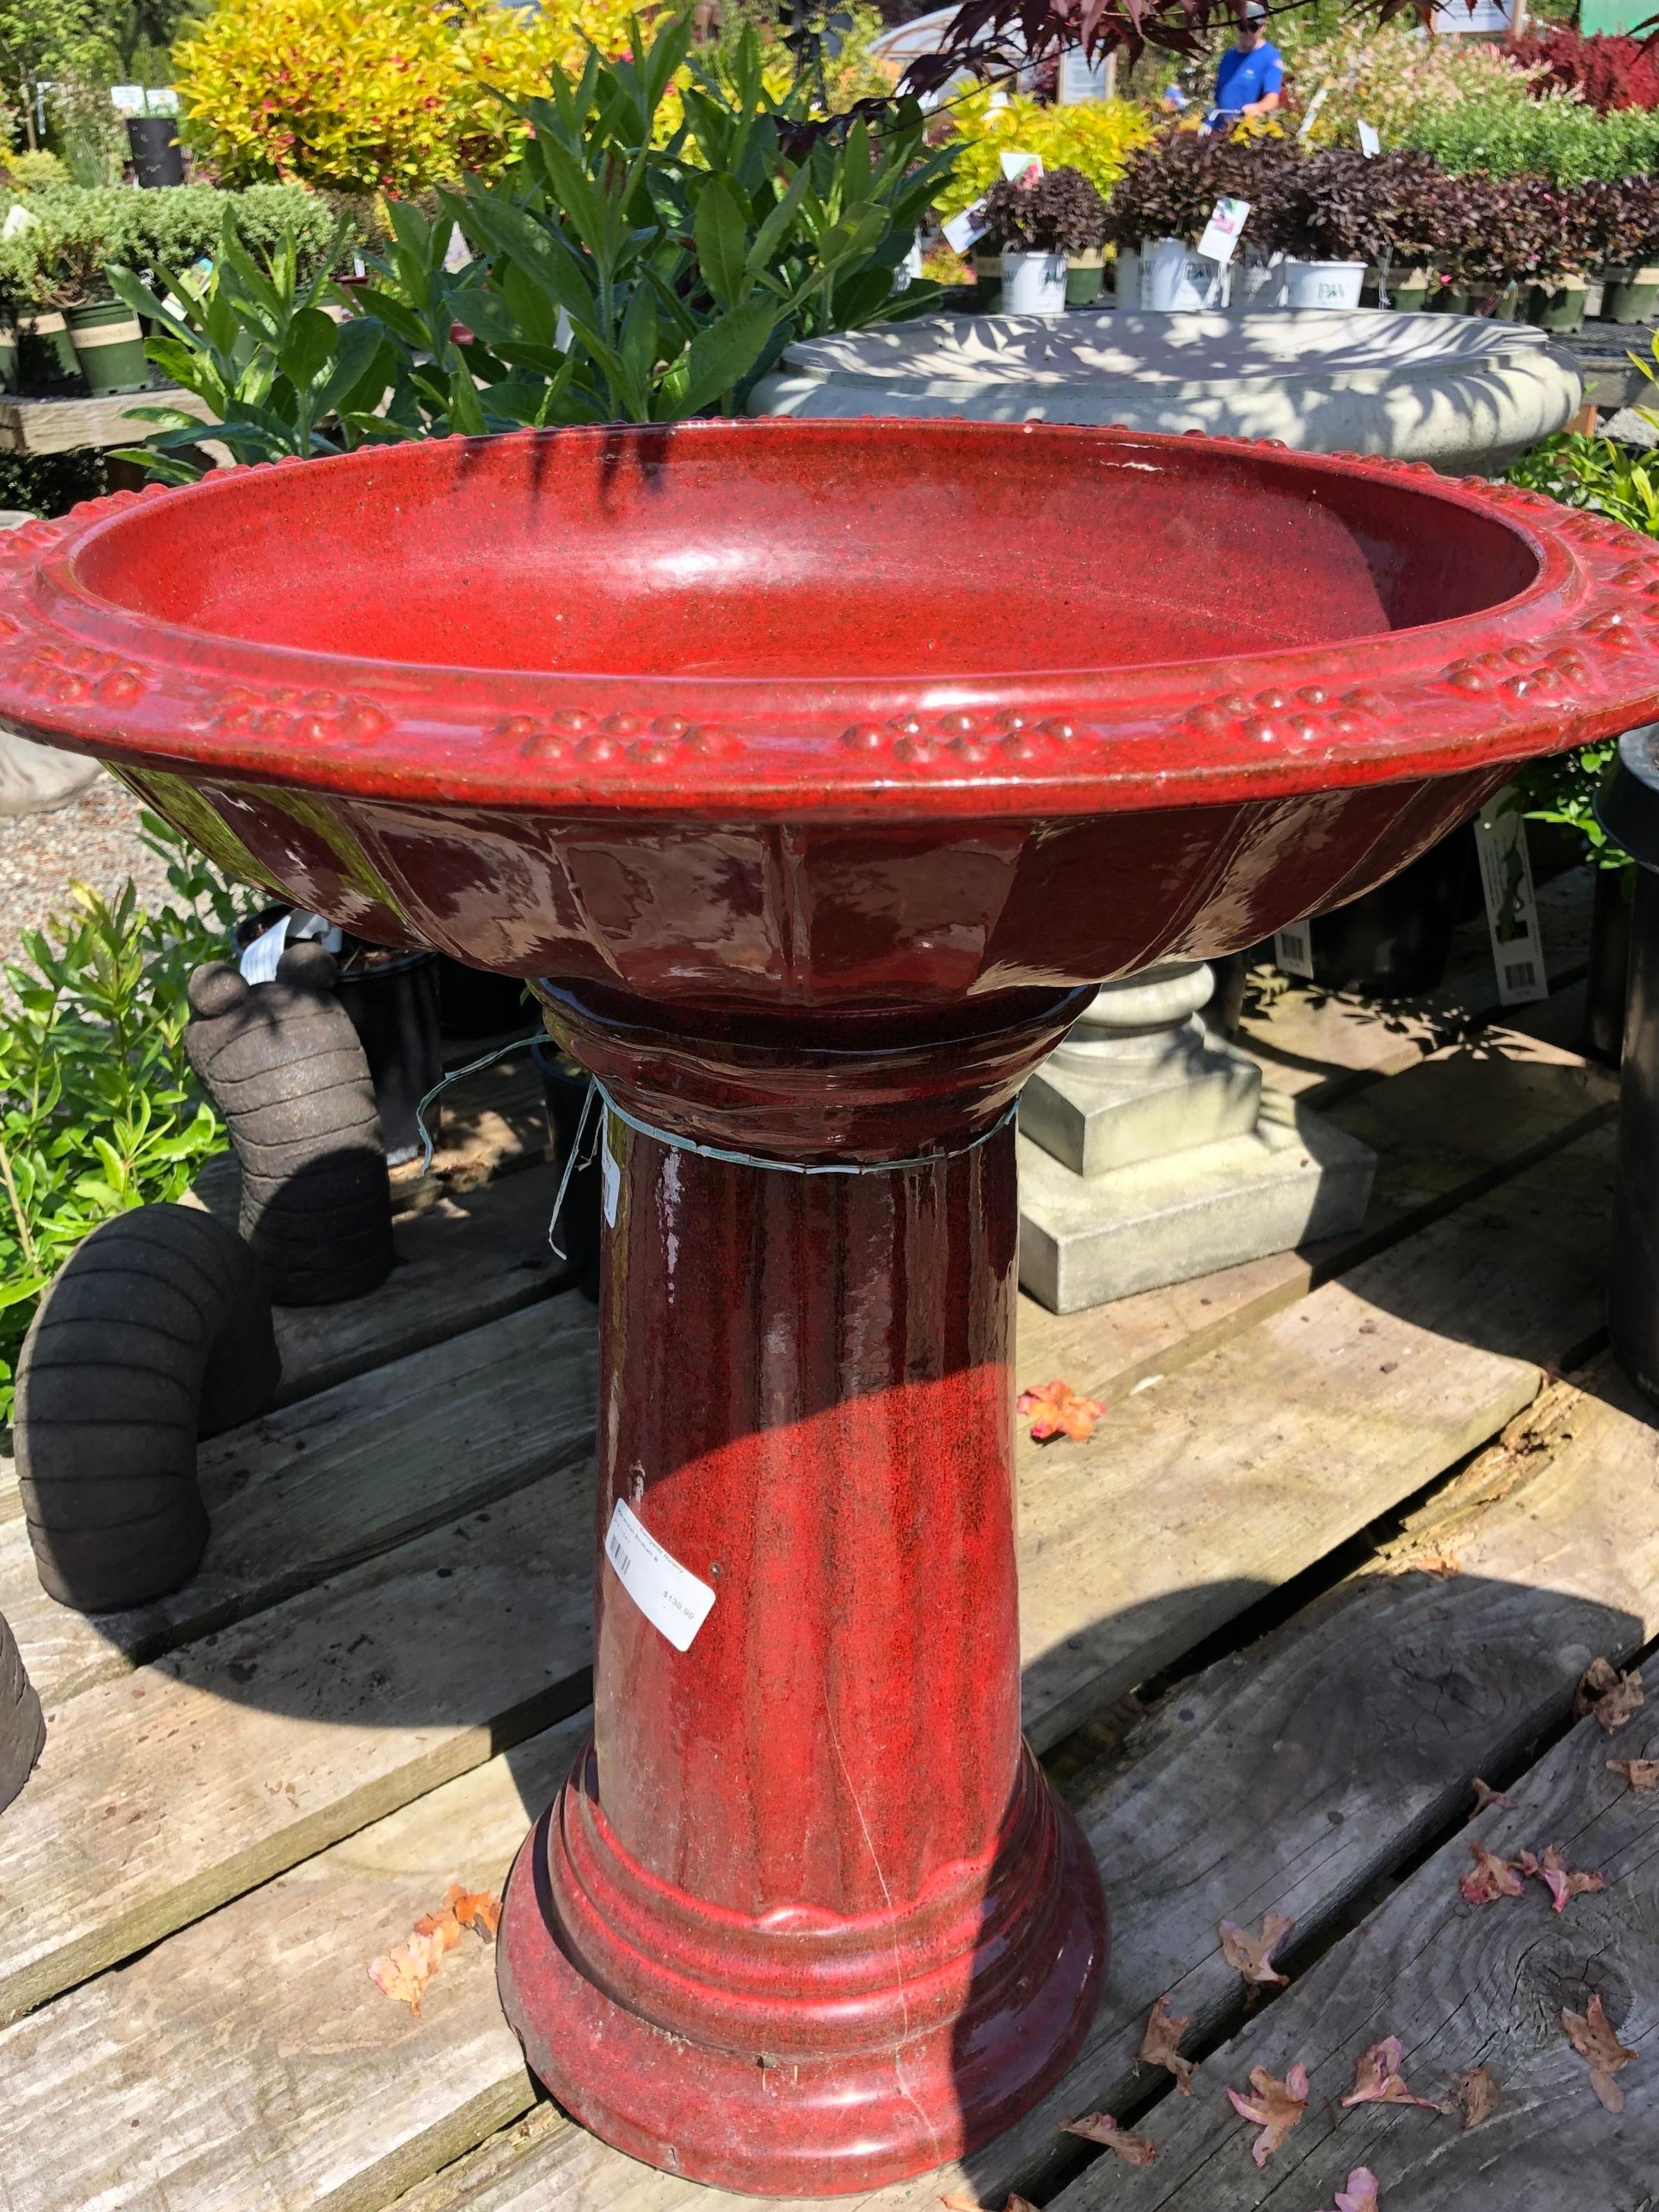 Verandah+red+birdbath.jpg